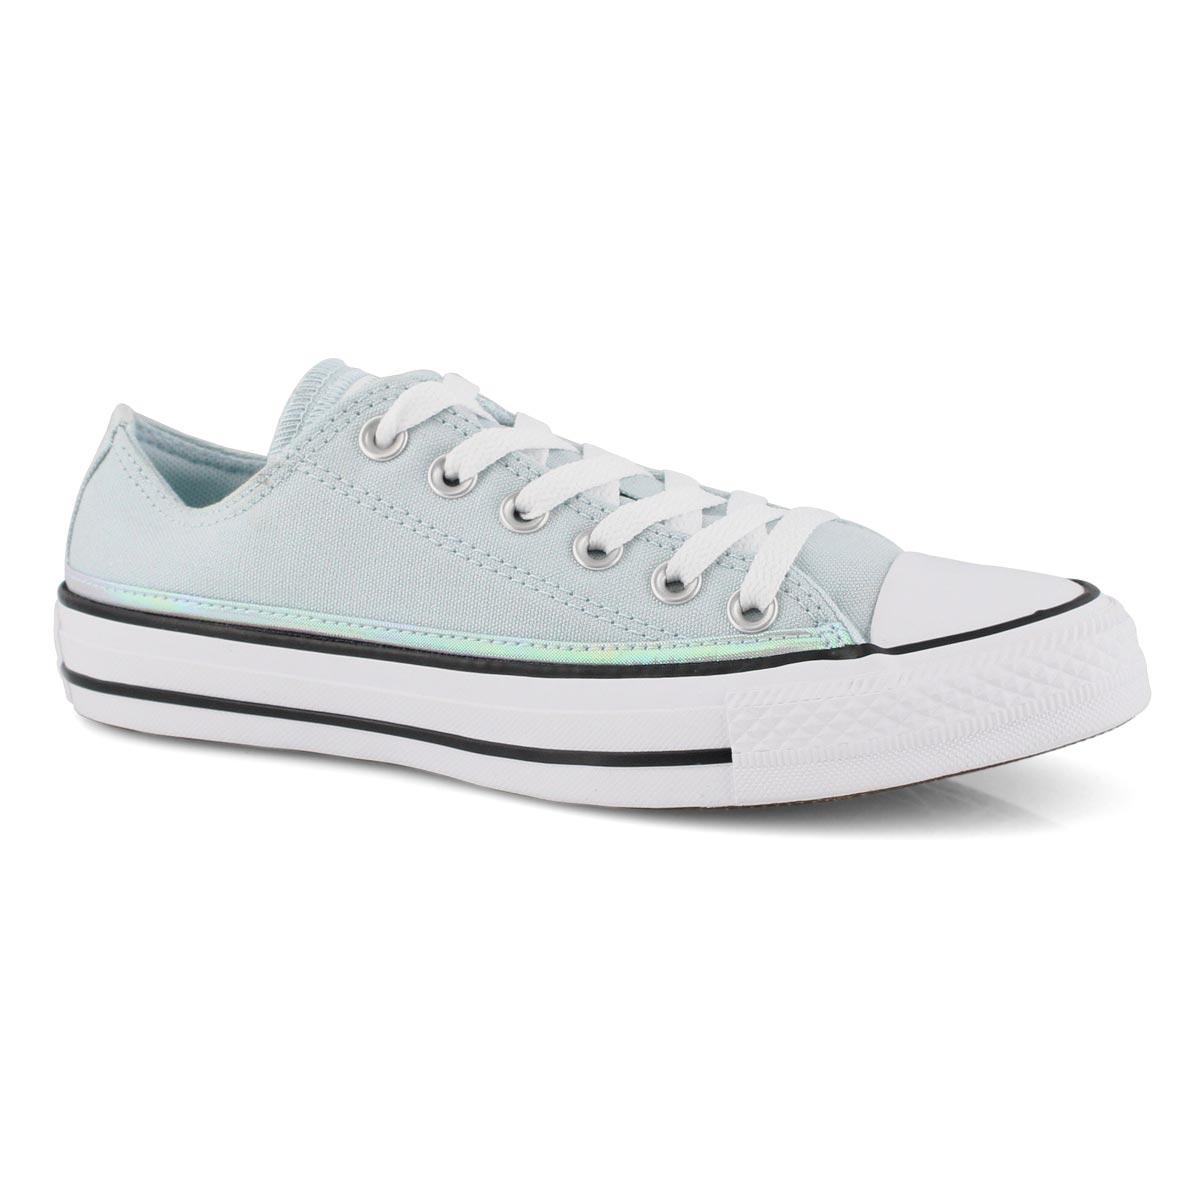 Women's Chuck Taylor All Star Classic Sneaker -Blu